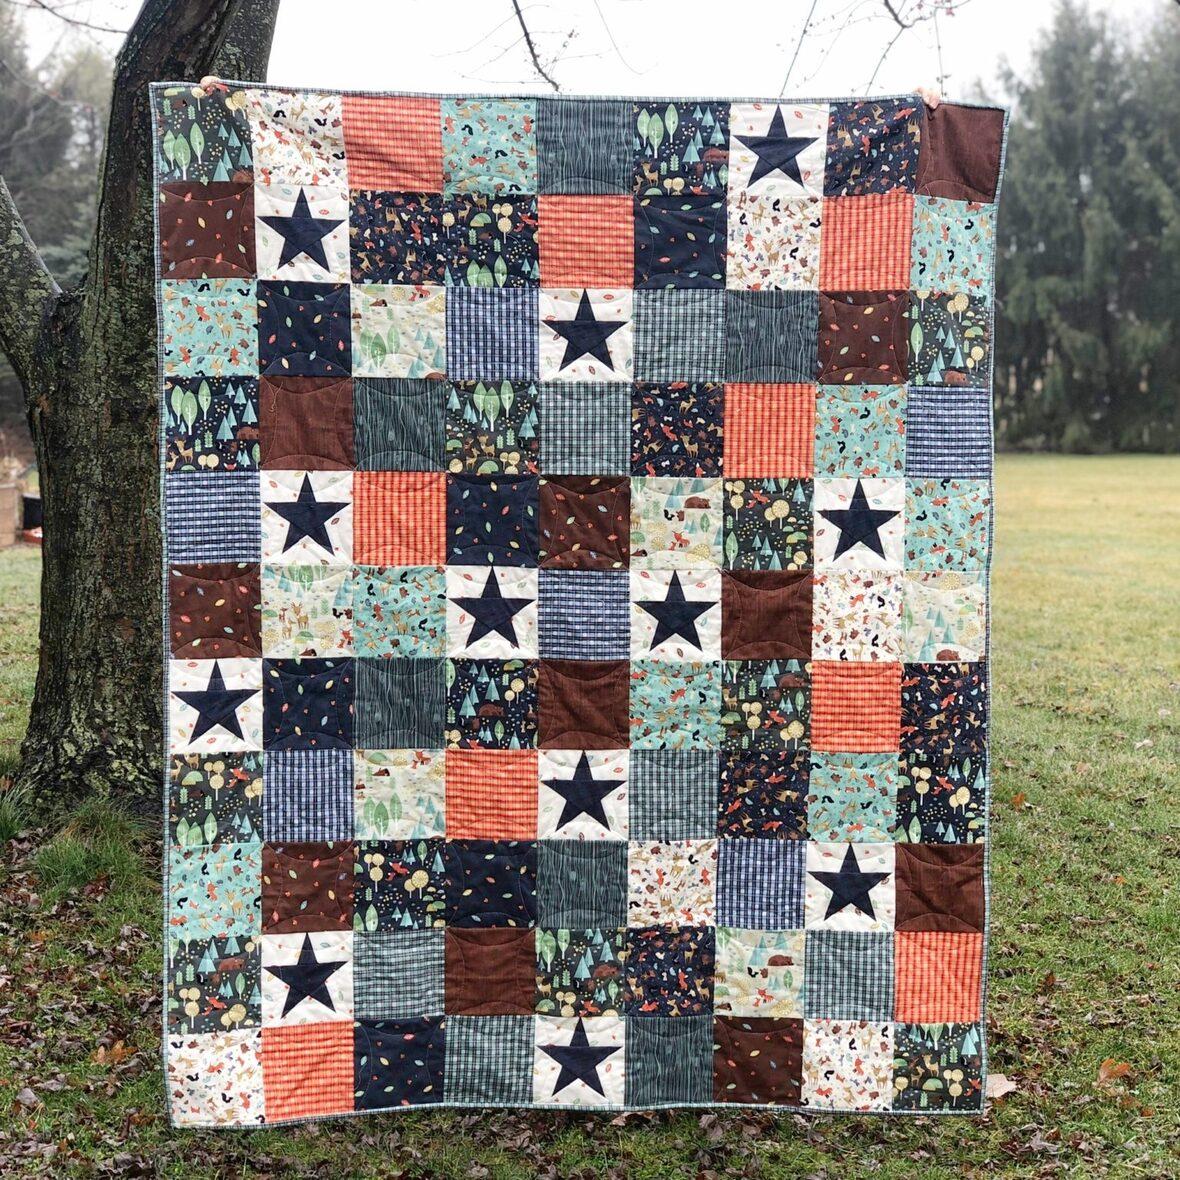 Starry Woodland Quilt Jessica Dayon RB Blog